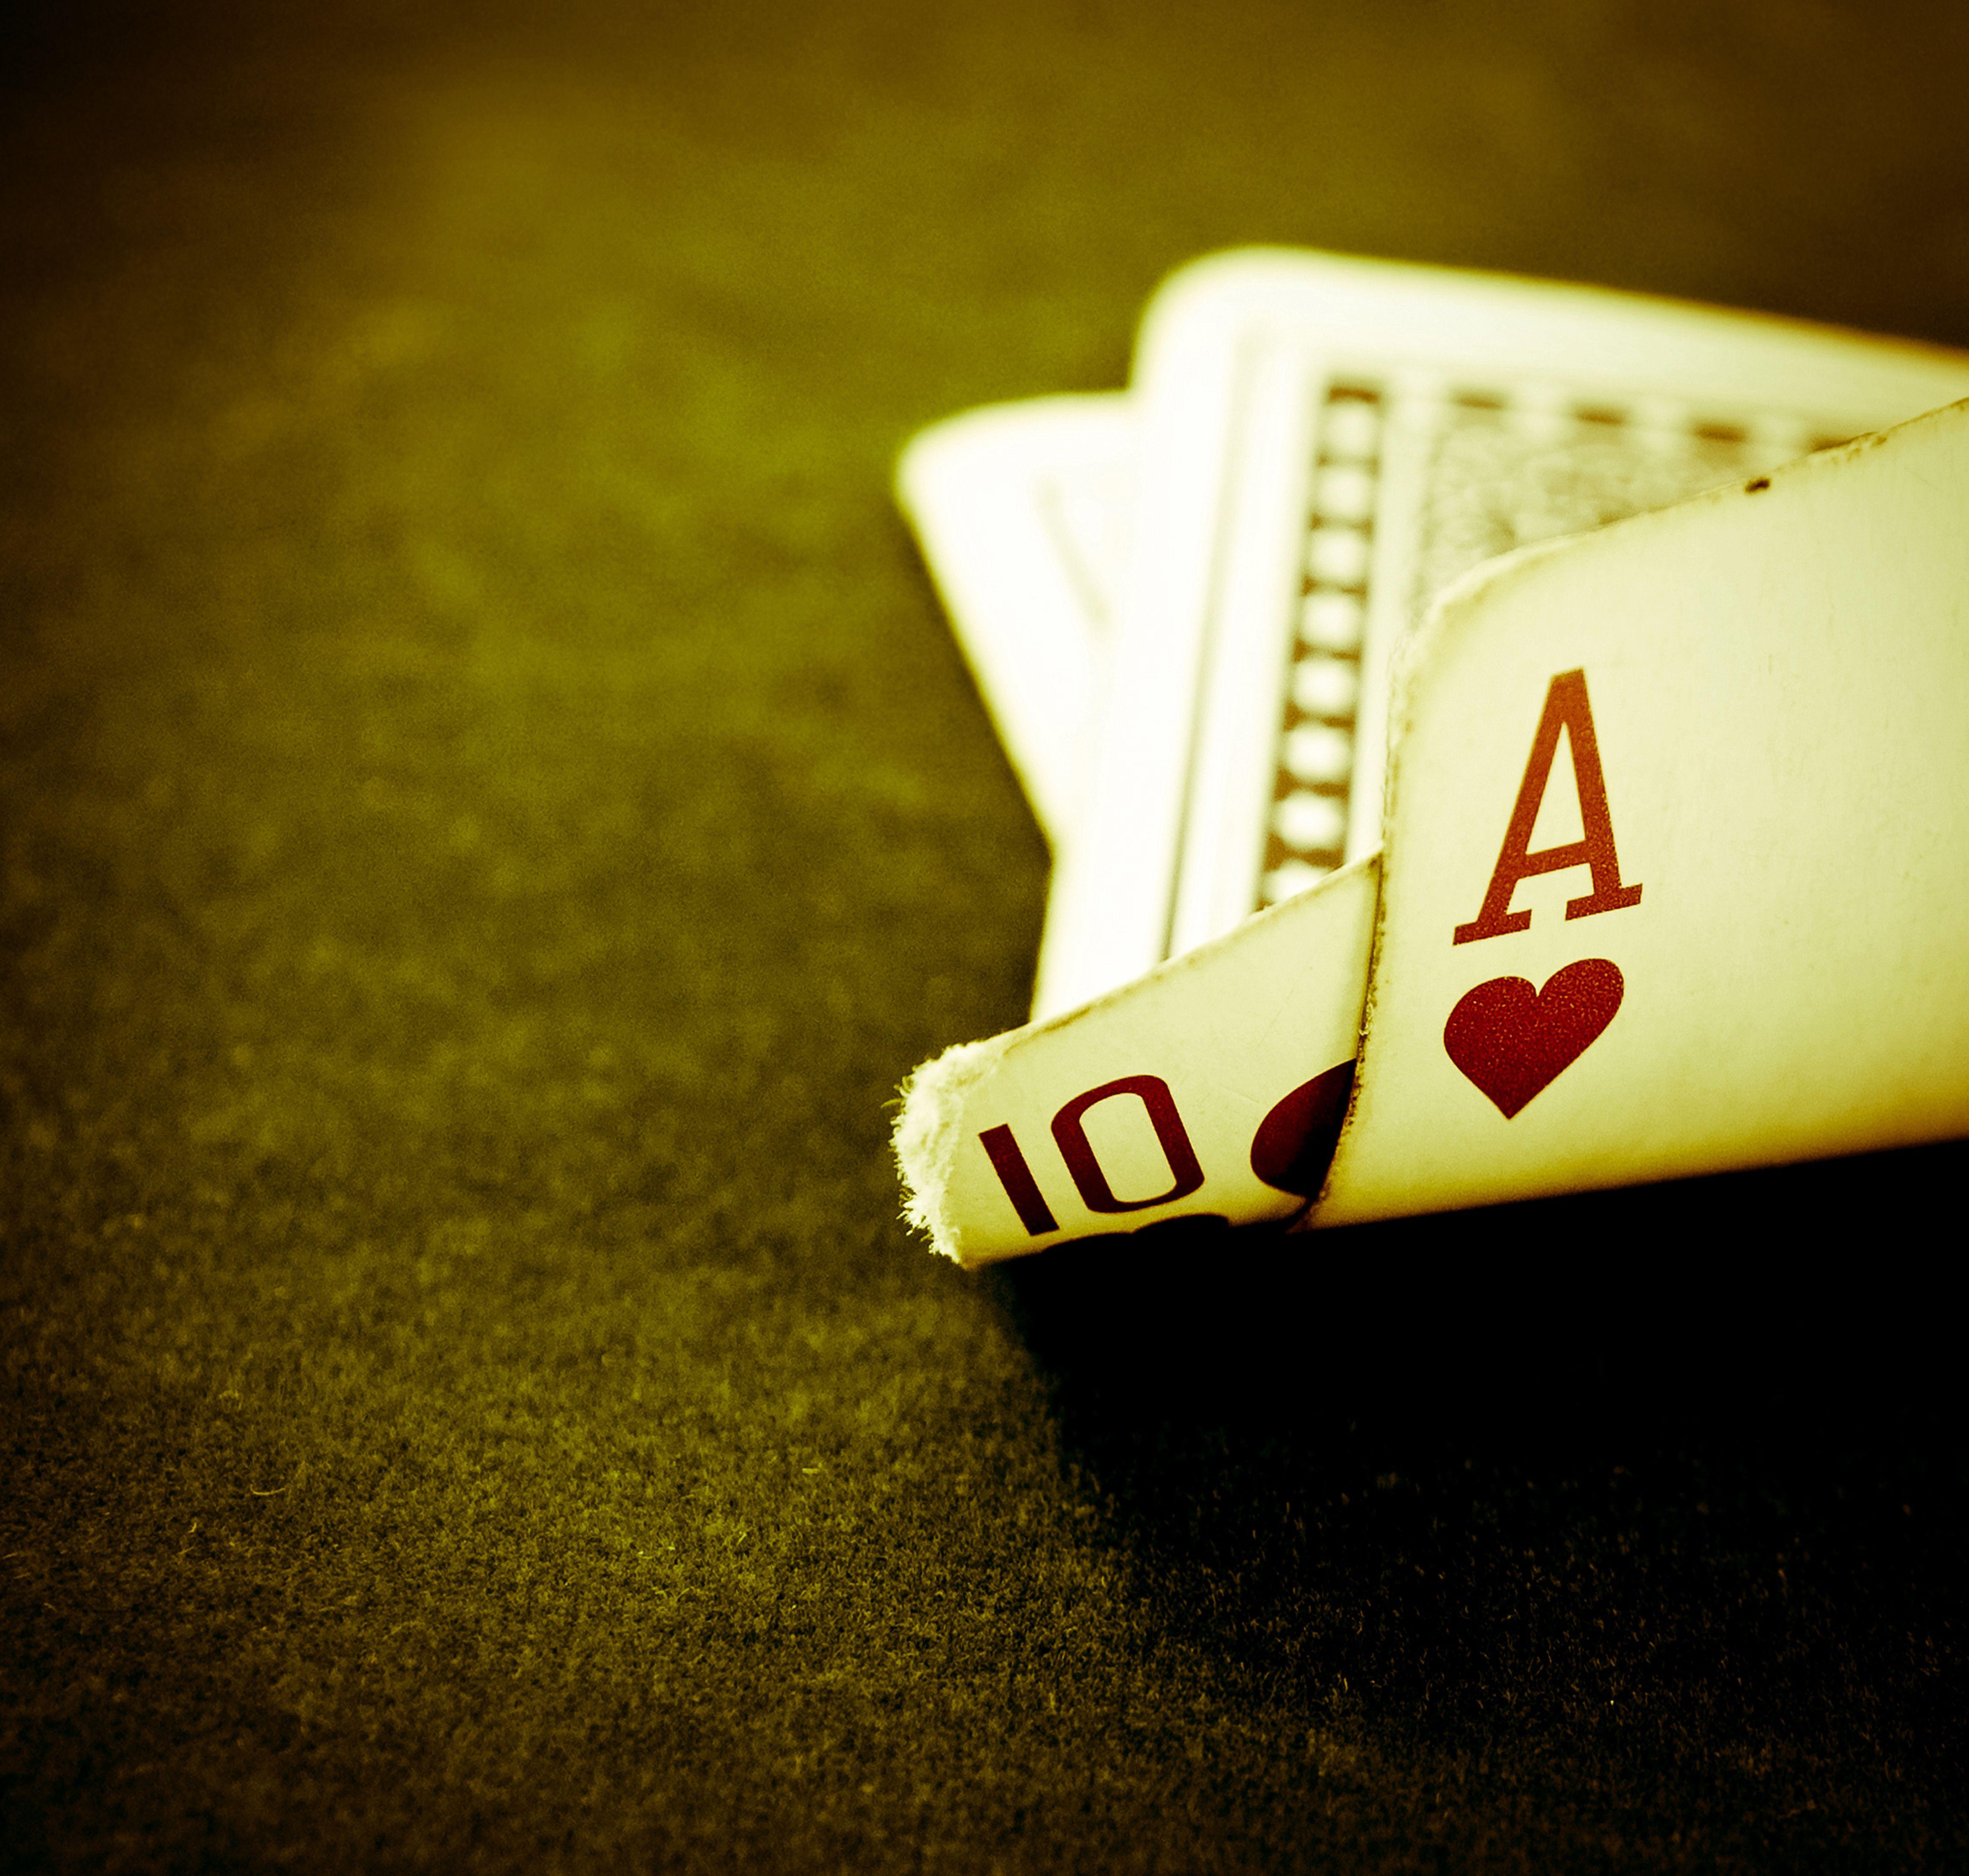 Blackjack table wallpaper - Awesome Wallpaper Blackjack